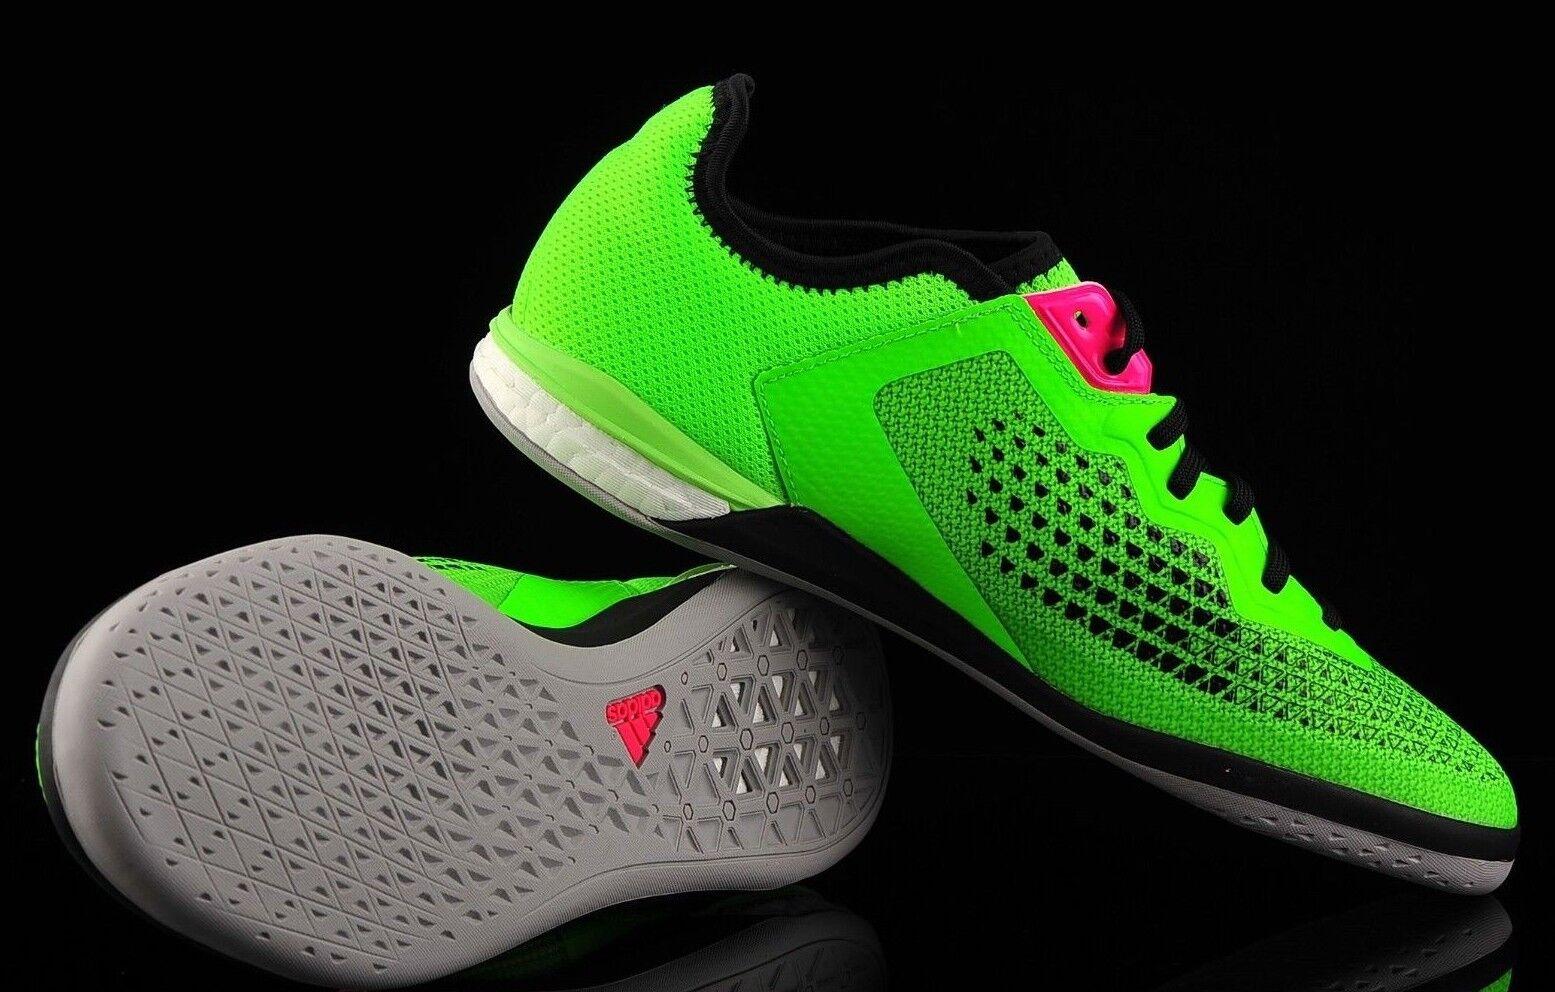 huge selection of 230e2 a79b6 ... fonctionnement chaussures 8.,. adidas Cloudfoam Ultimate Trainers8.5 US  9 EUR EUR EUR 42.2 3 REF 1068